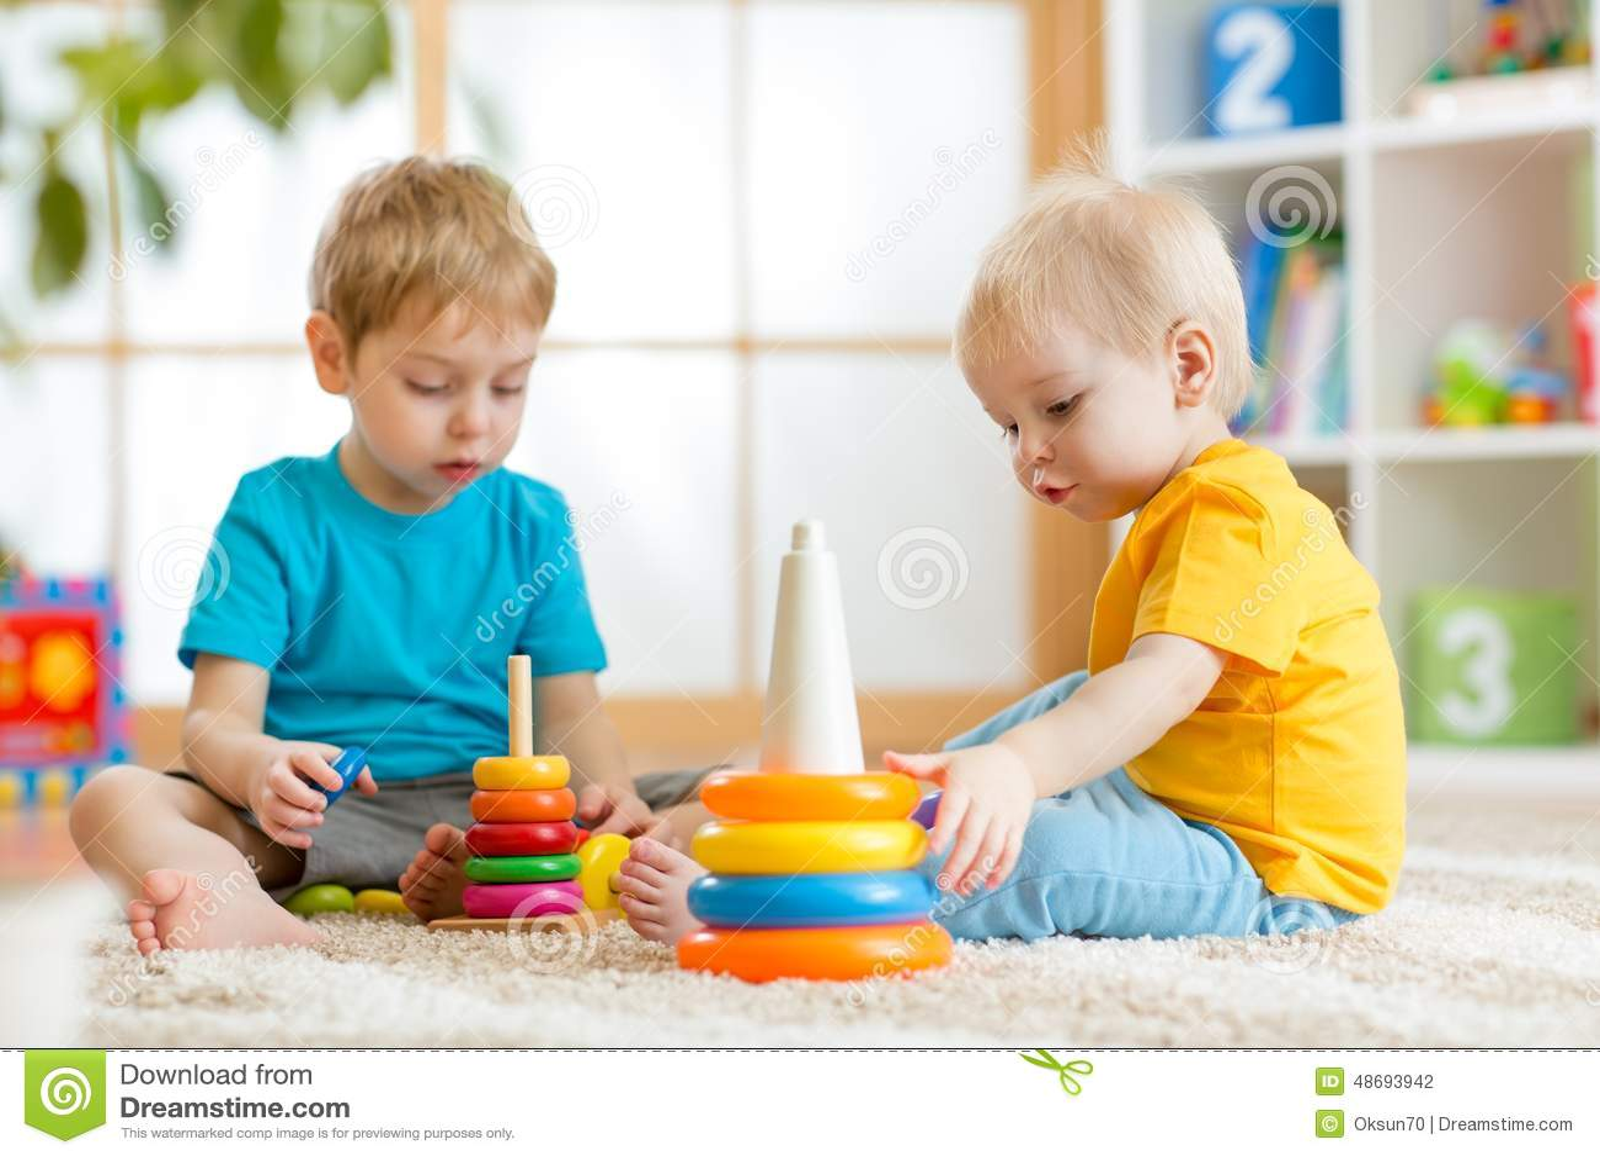 teaching children how to change babies